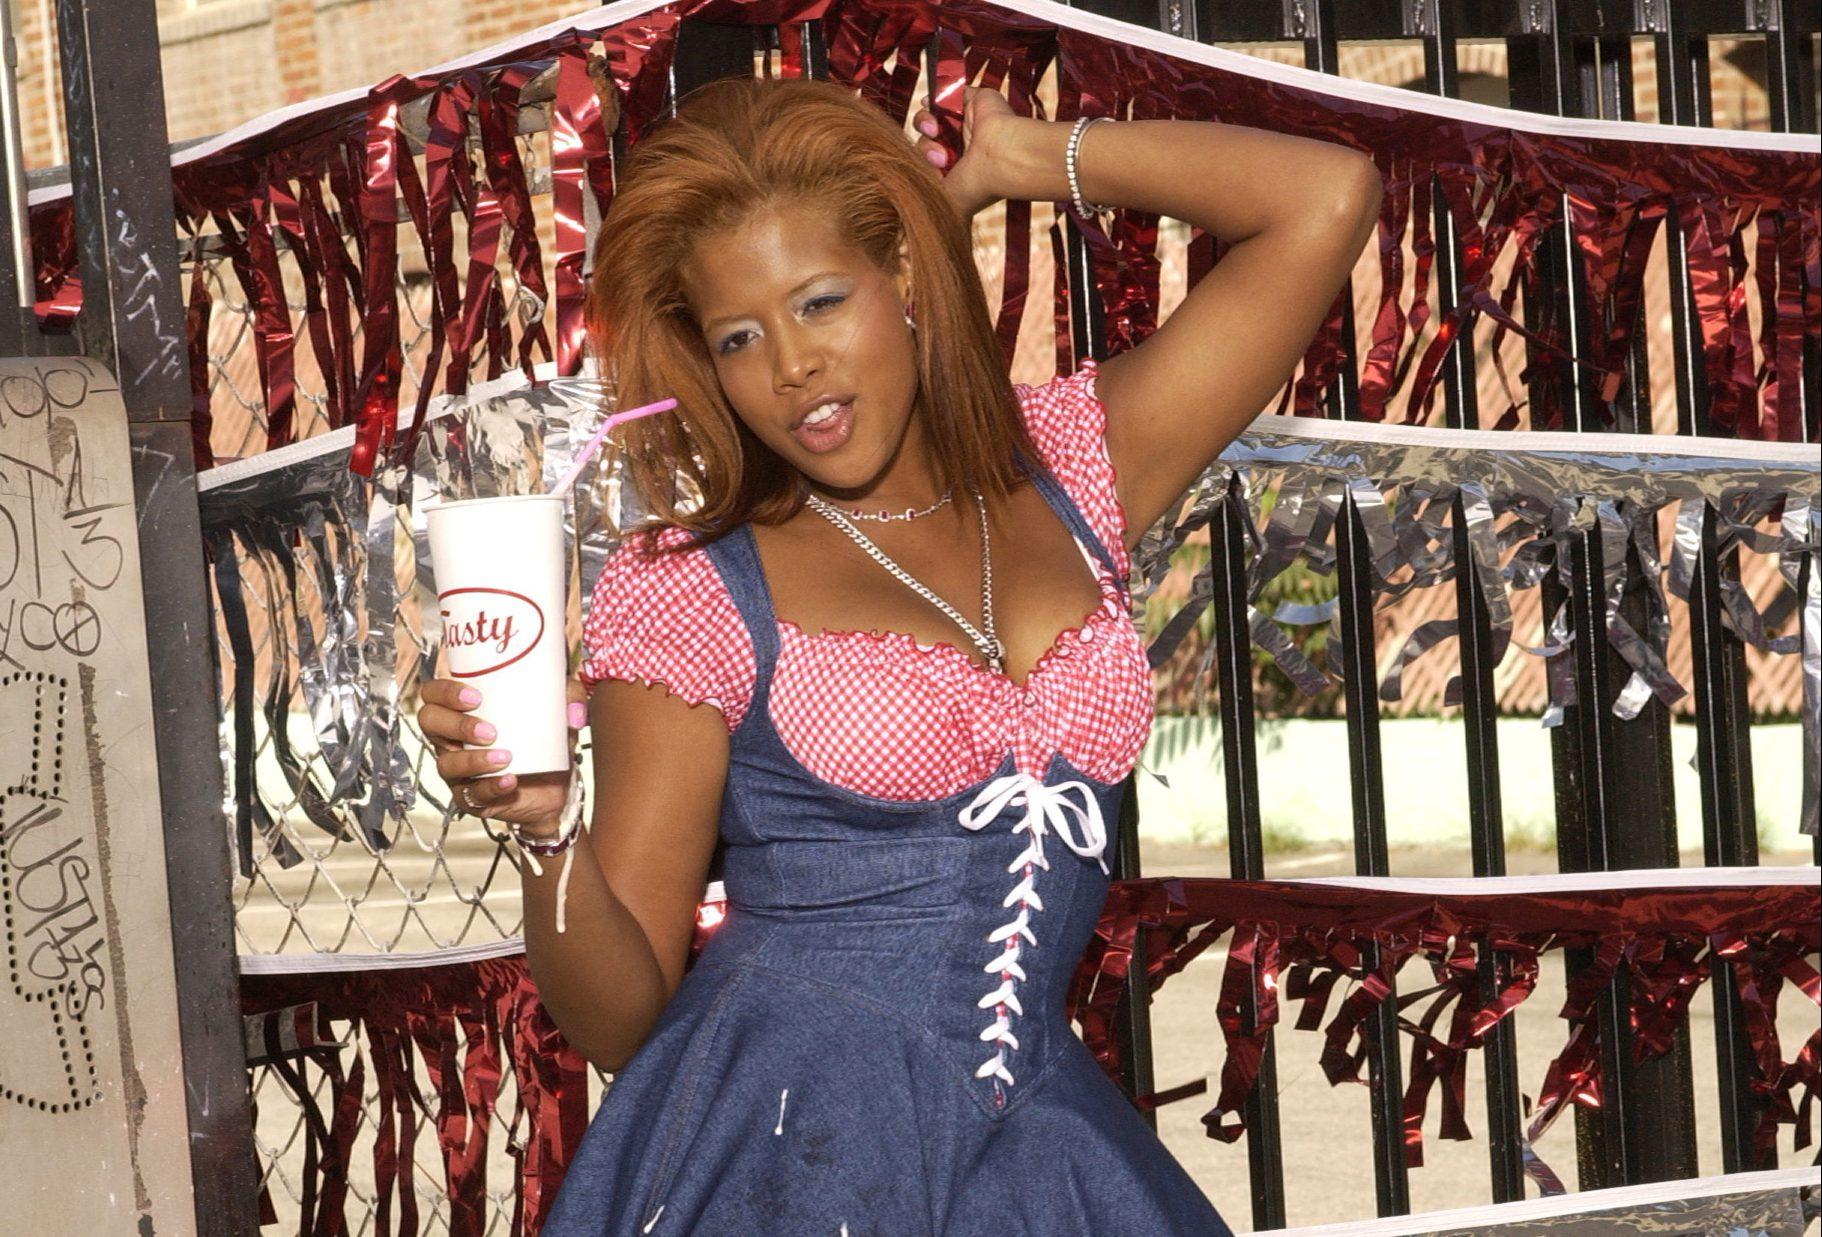 Kelis - Stills from the Video 'Milkshake'